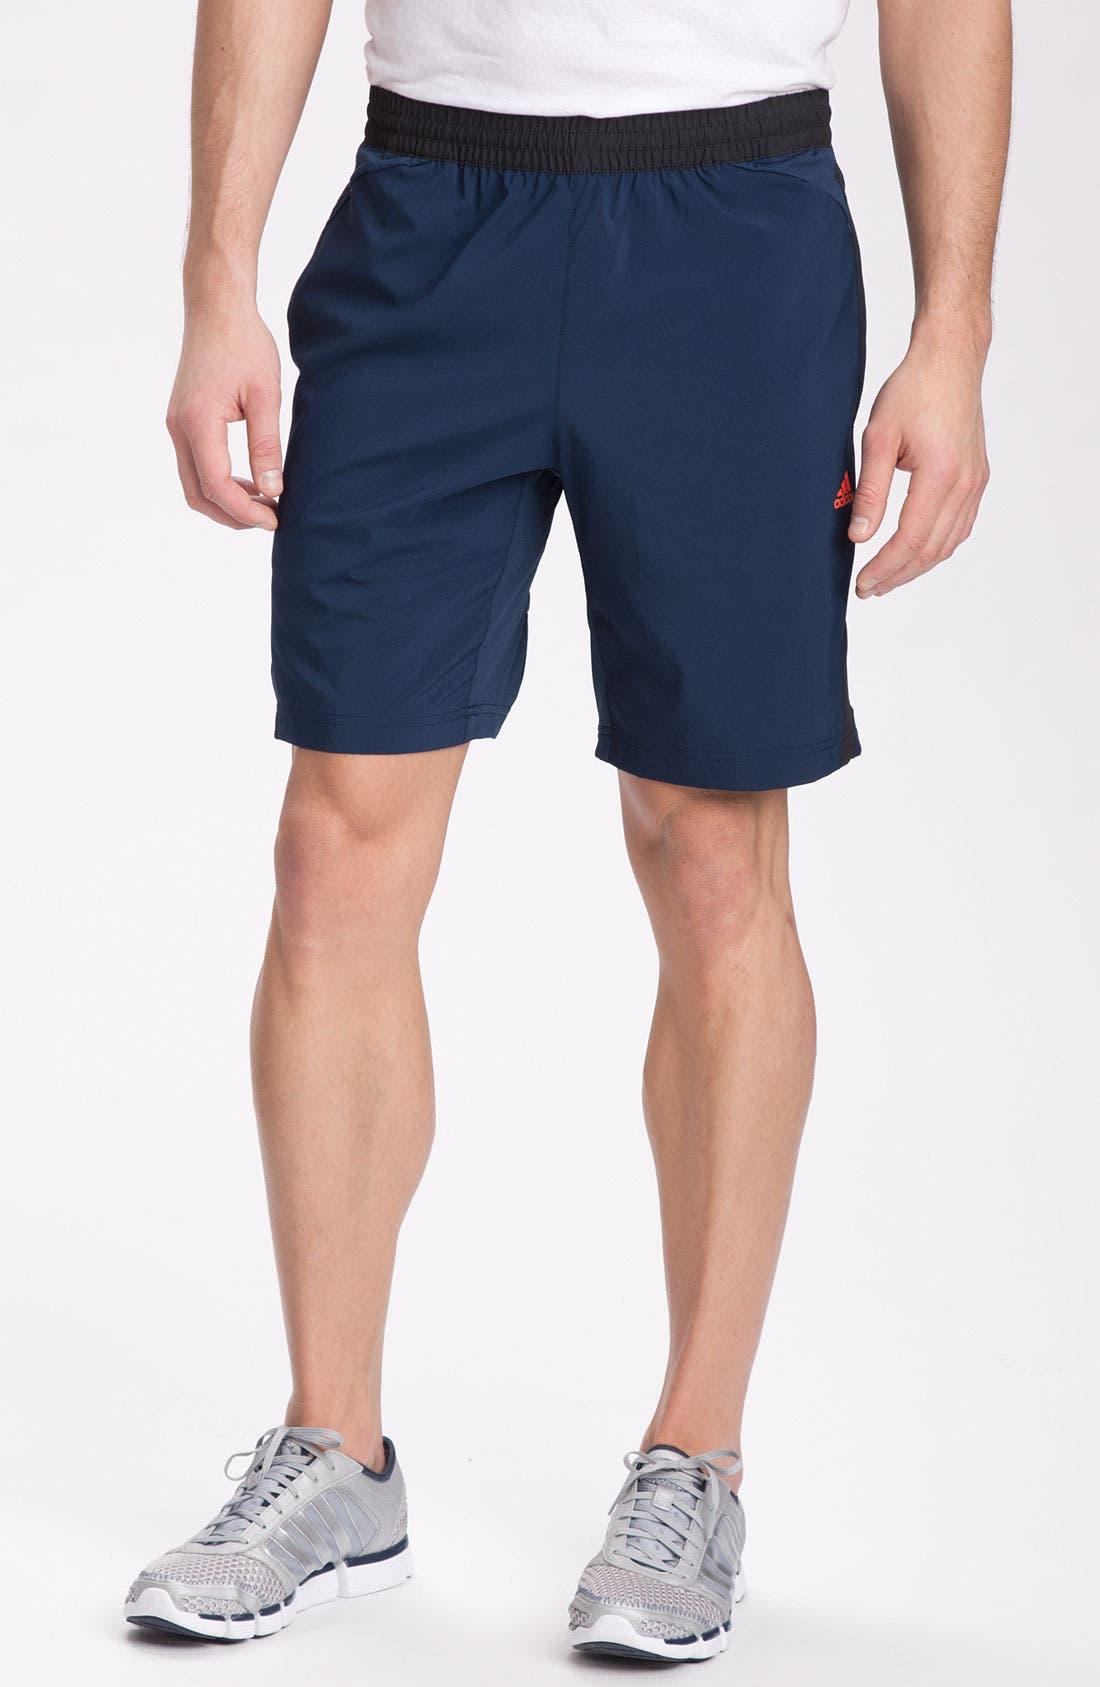 Alternate Image 1 Selected - adidas 'CLIMA365' Knit Shorts